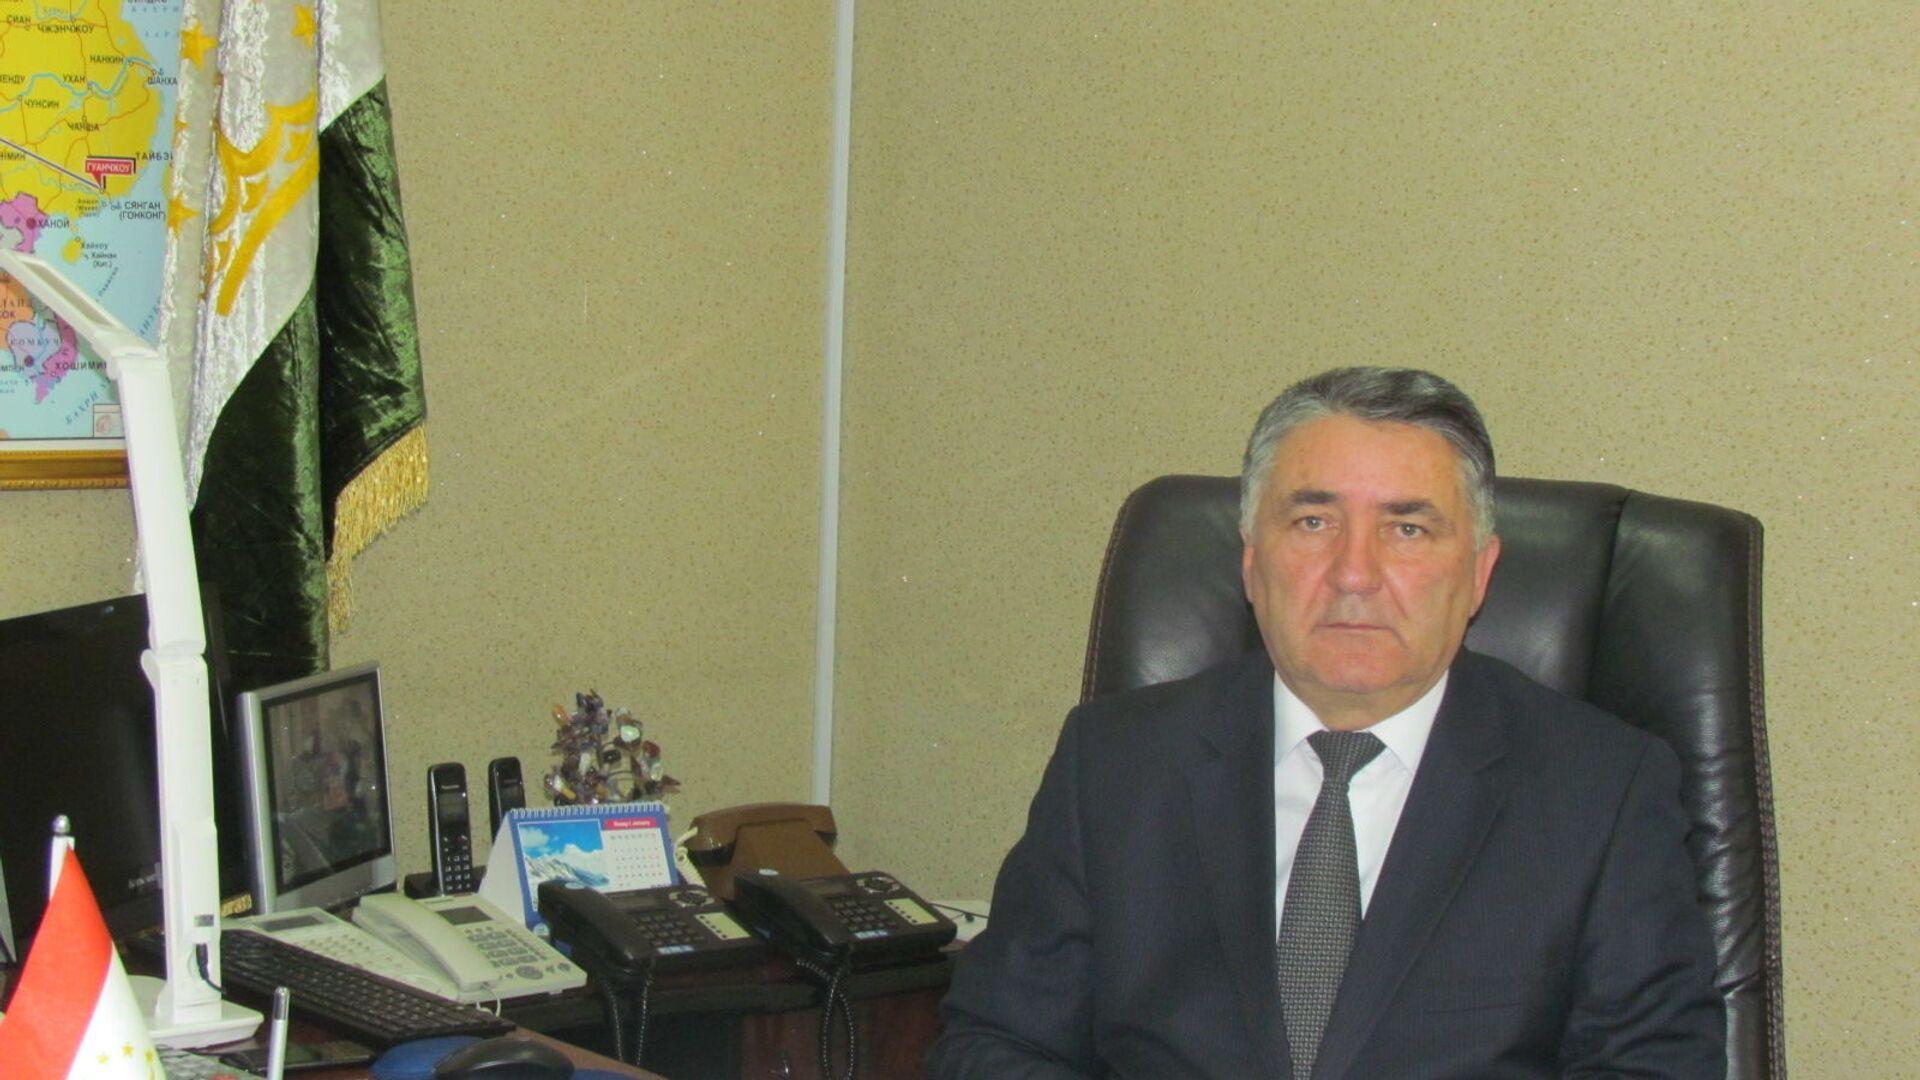 Министр транспорта Республики Таджикистан Худоёрзода Худоёр Завкибек - Sputnik Тоҷикистон, 1920, 04.04.2021